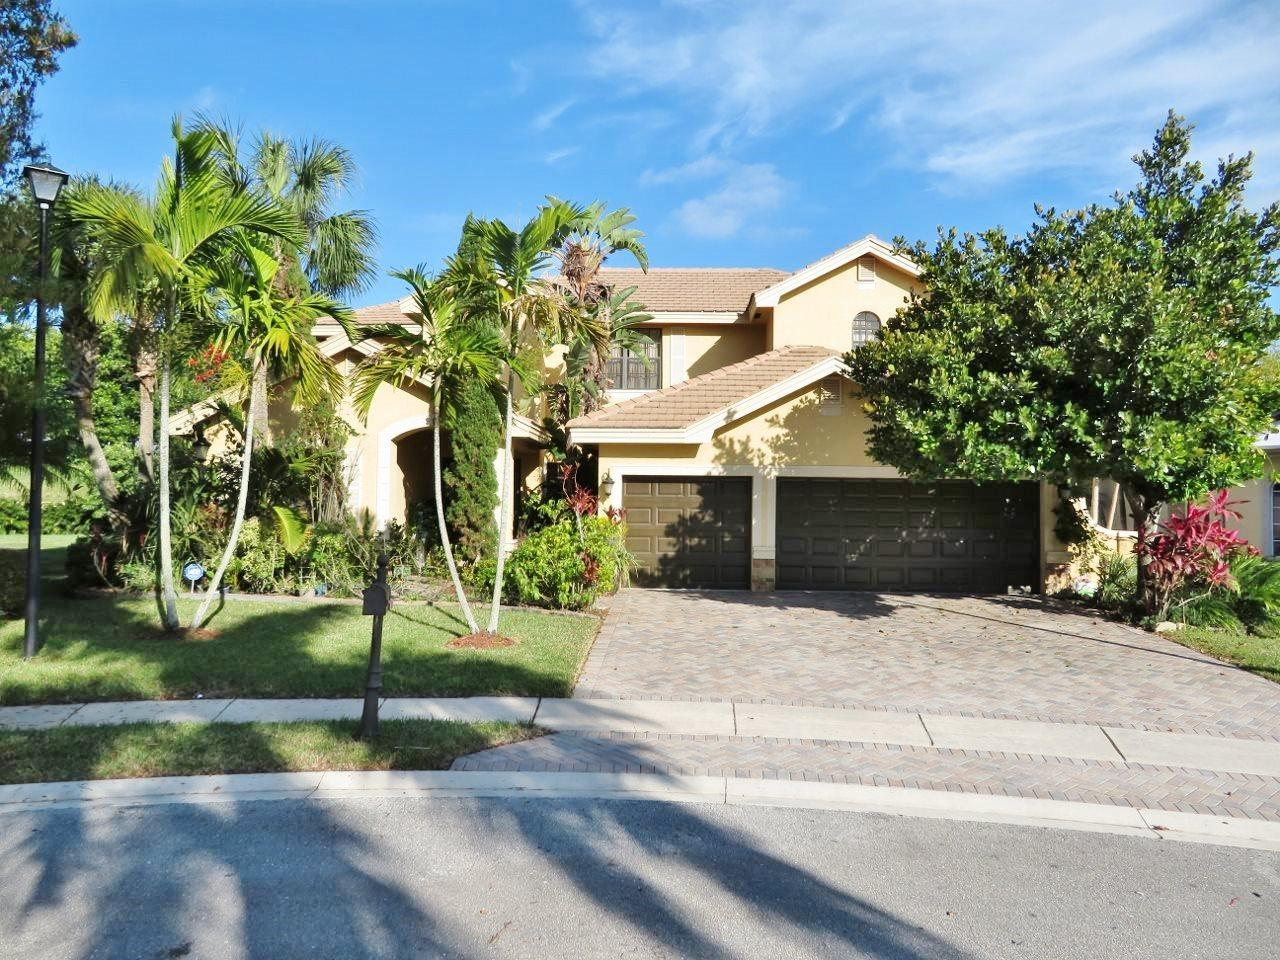 Photo of 10301 Trianon Place, Wellington, FL 33449